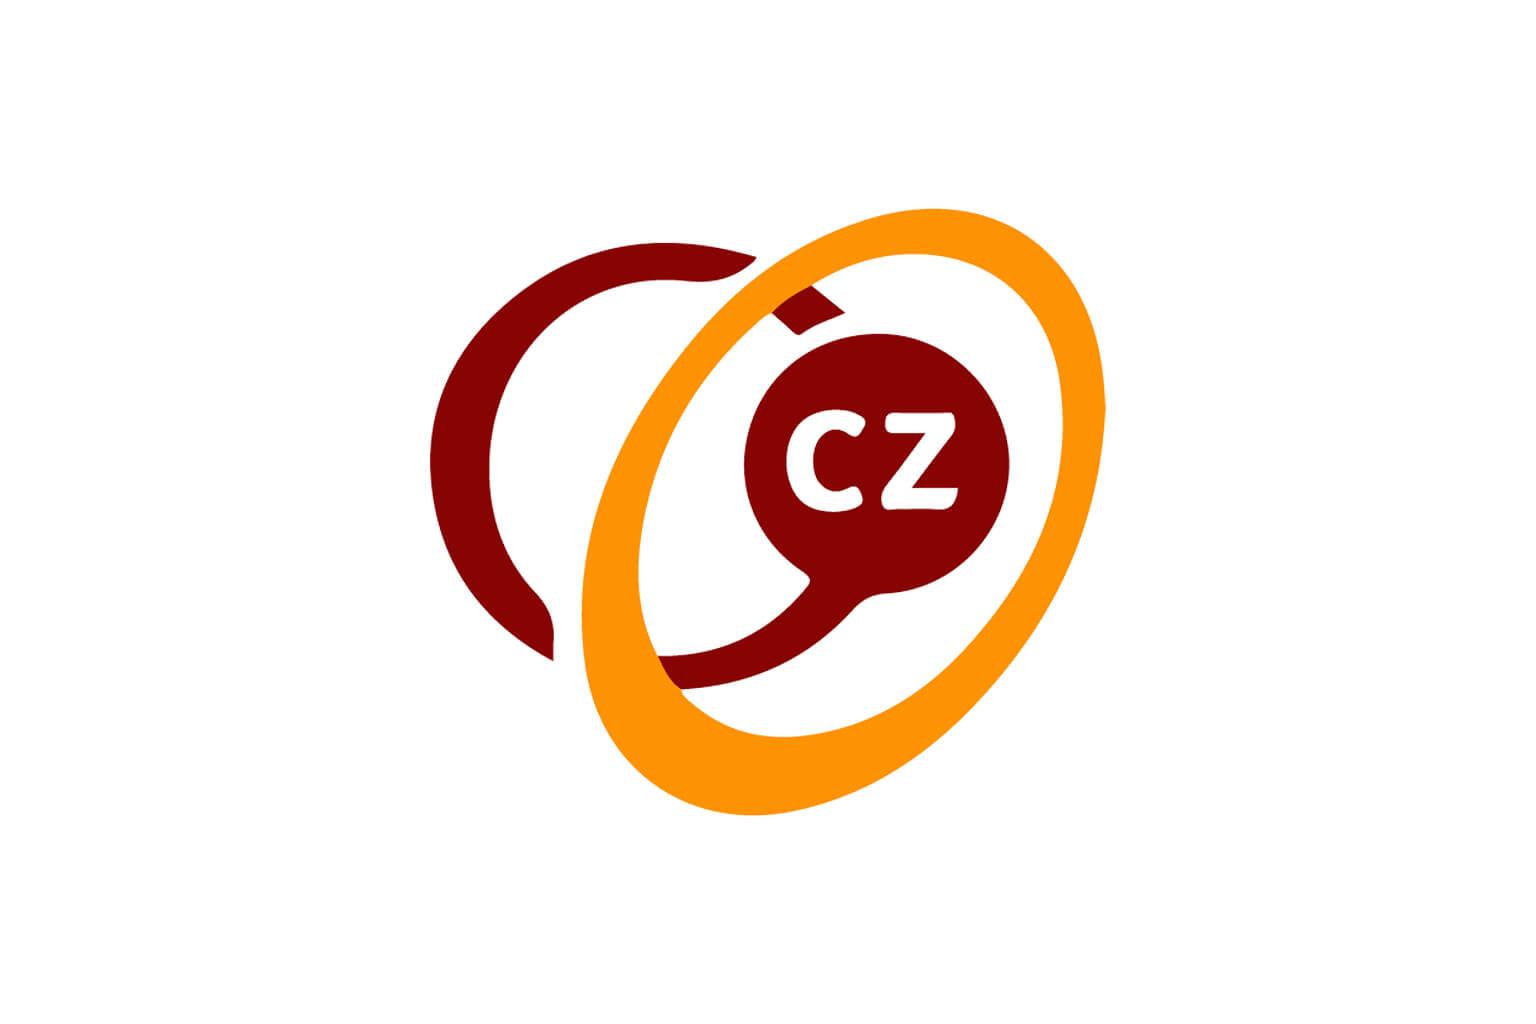 CZ - Netherlands